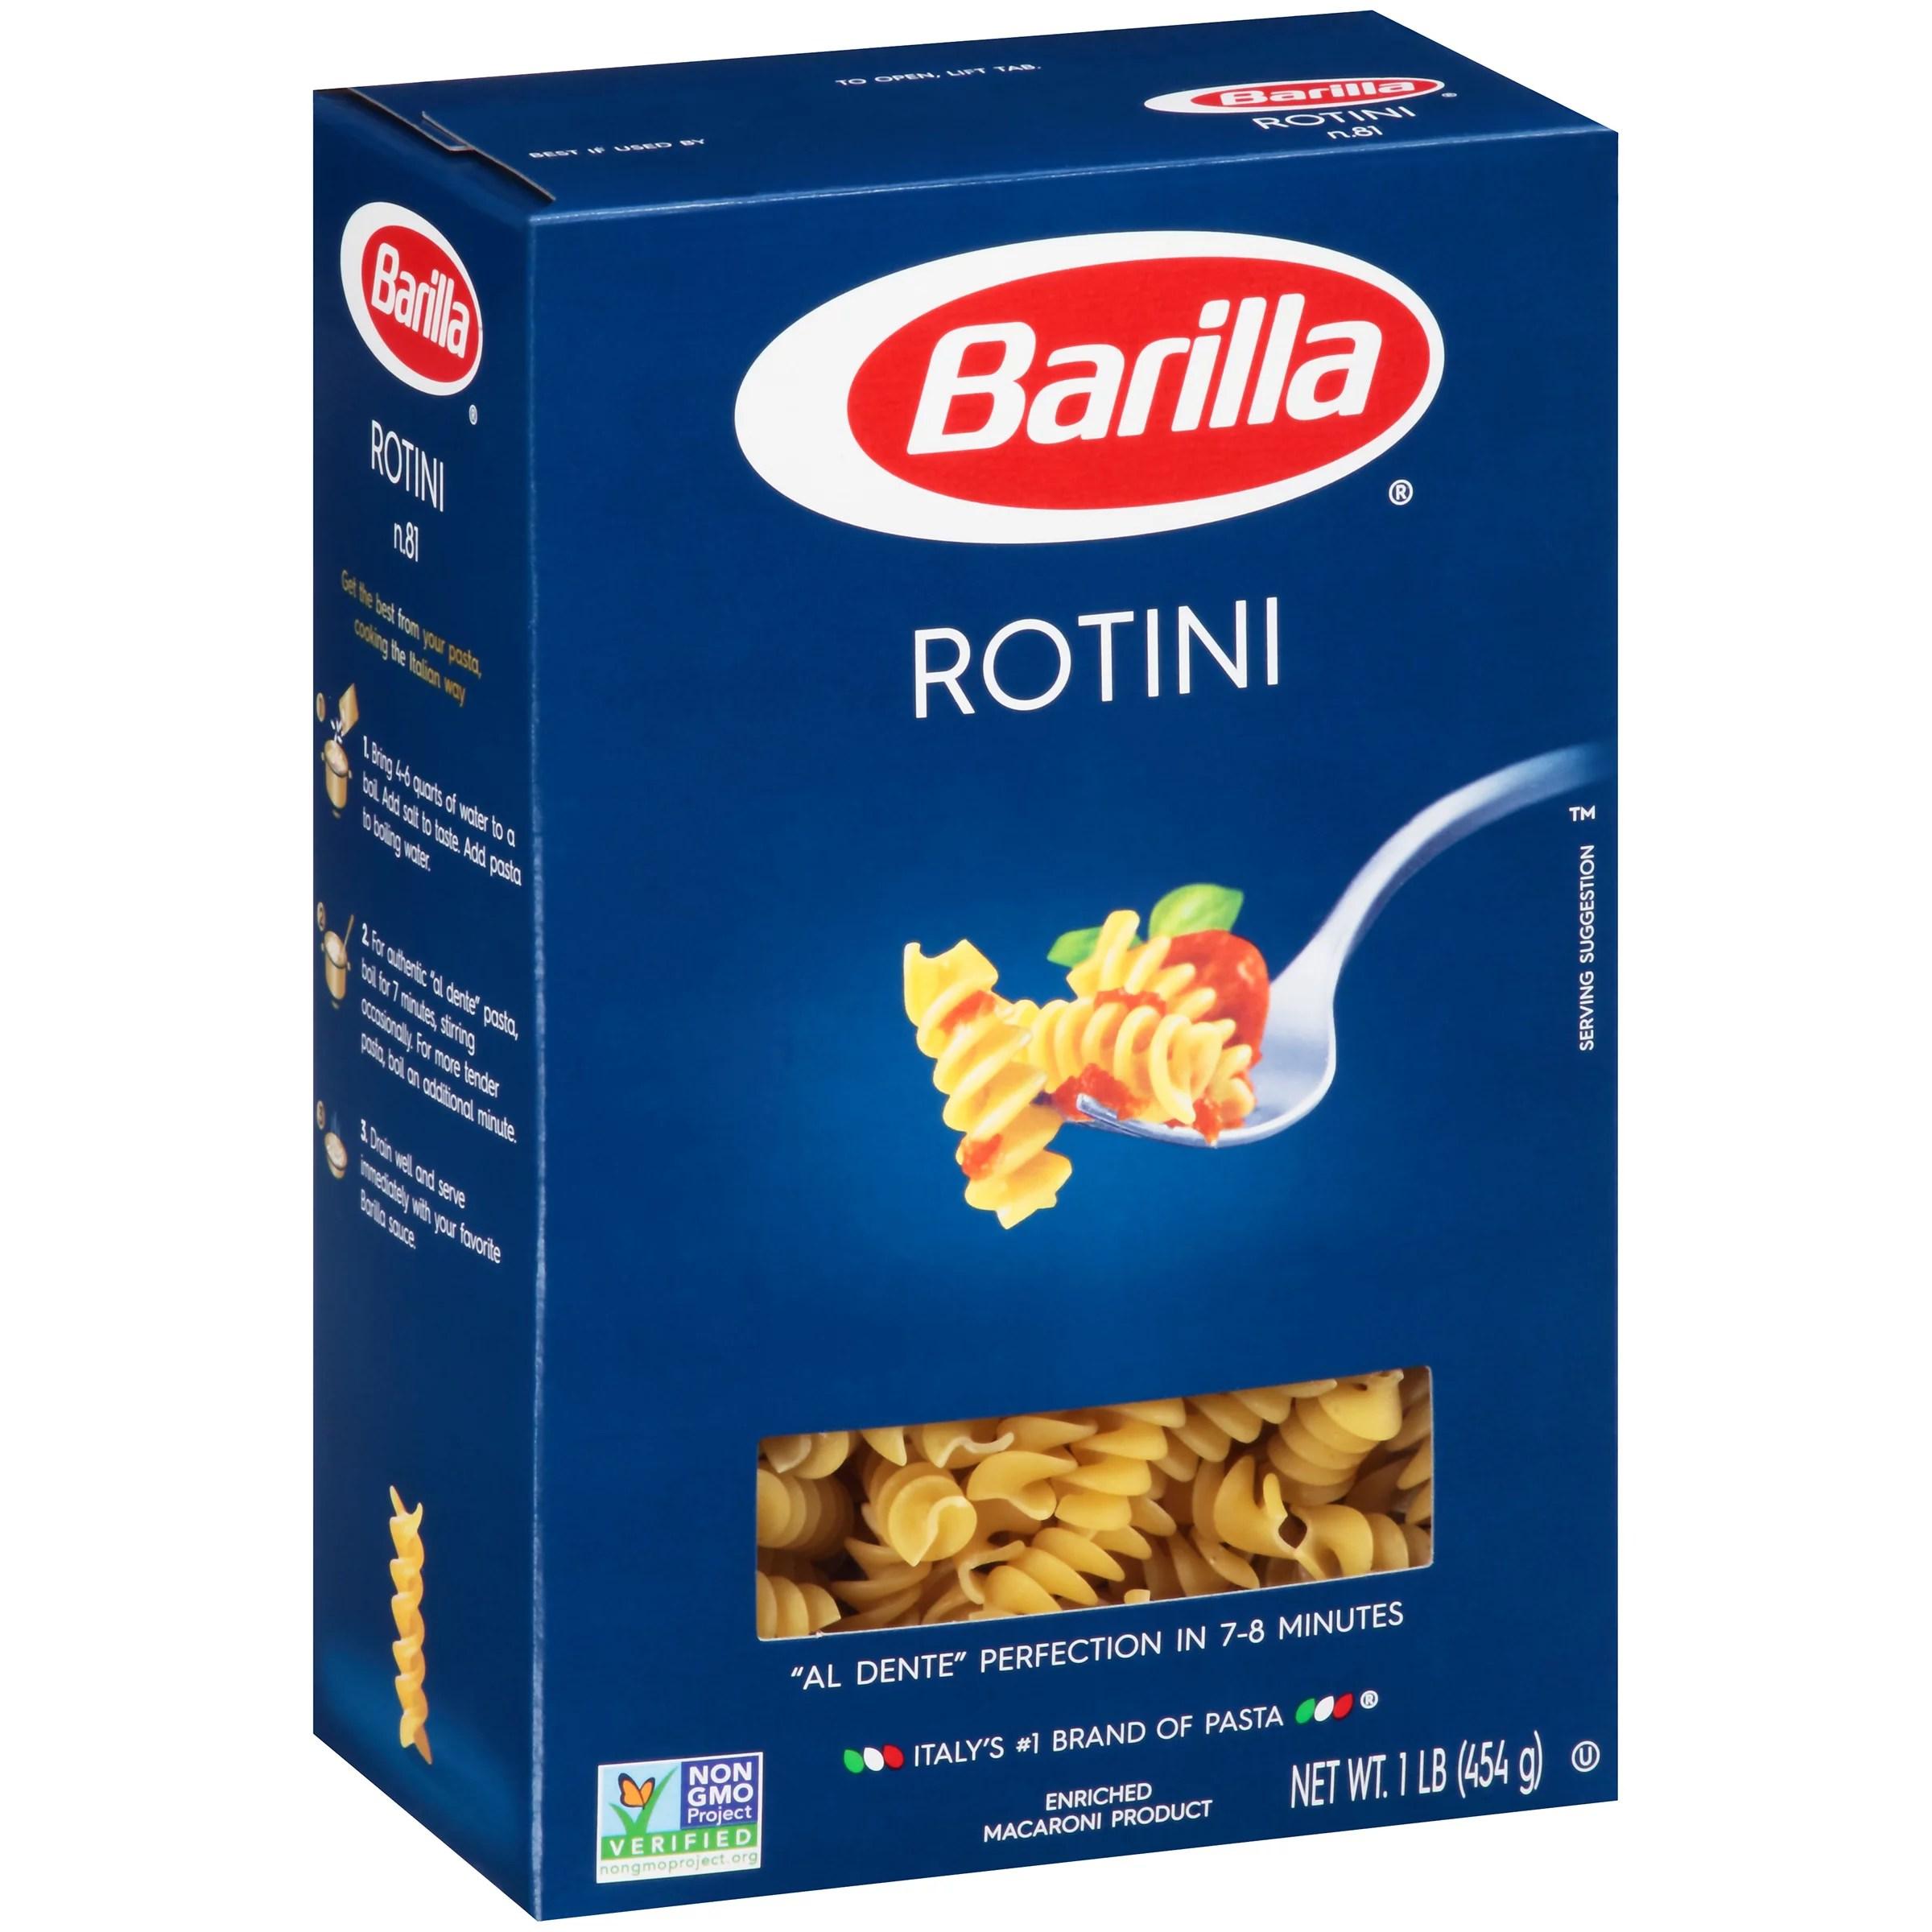 Barilla Rotini Pasta 1 lb Walmartcom